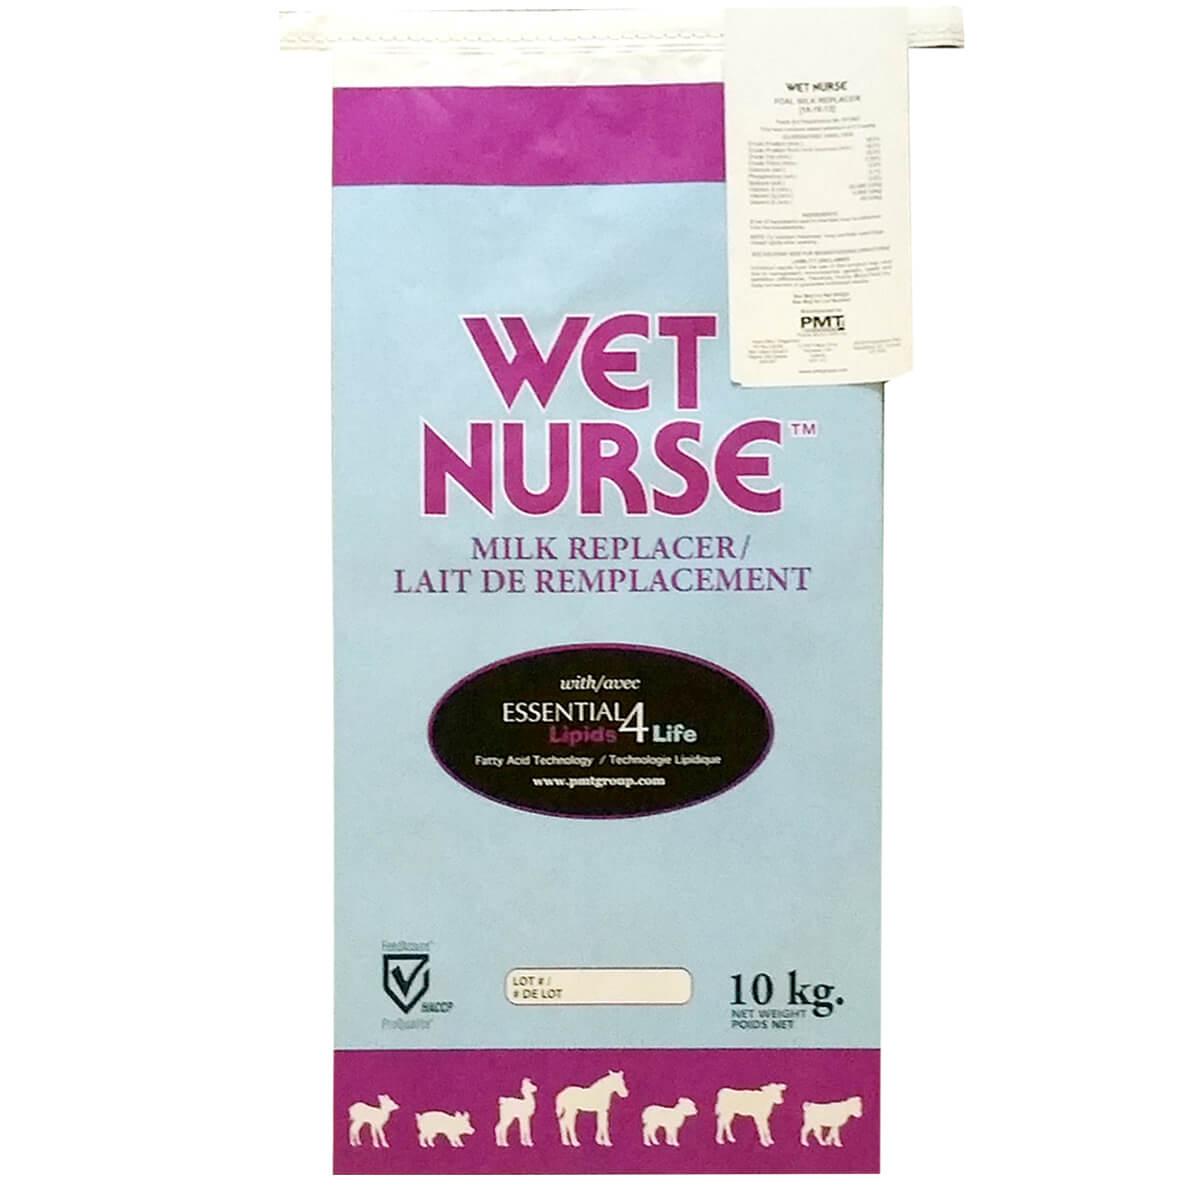 Wet Nurse™ Foal Milk Replacer White Tag - 10 kg